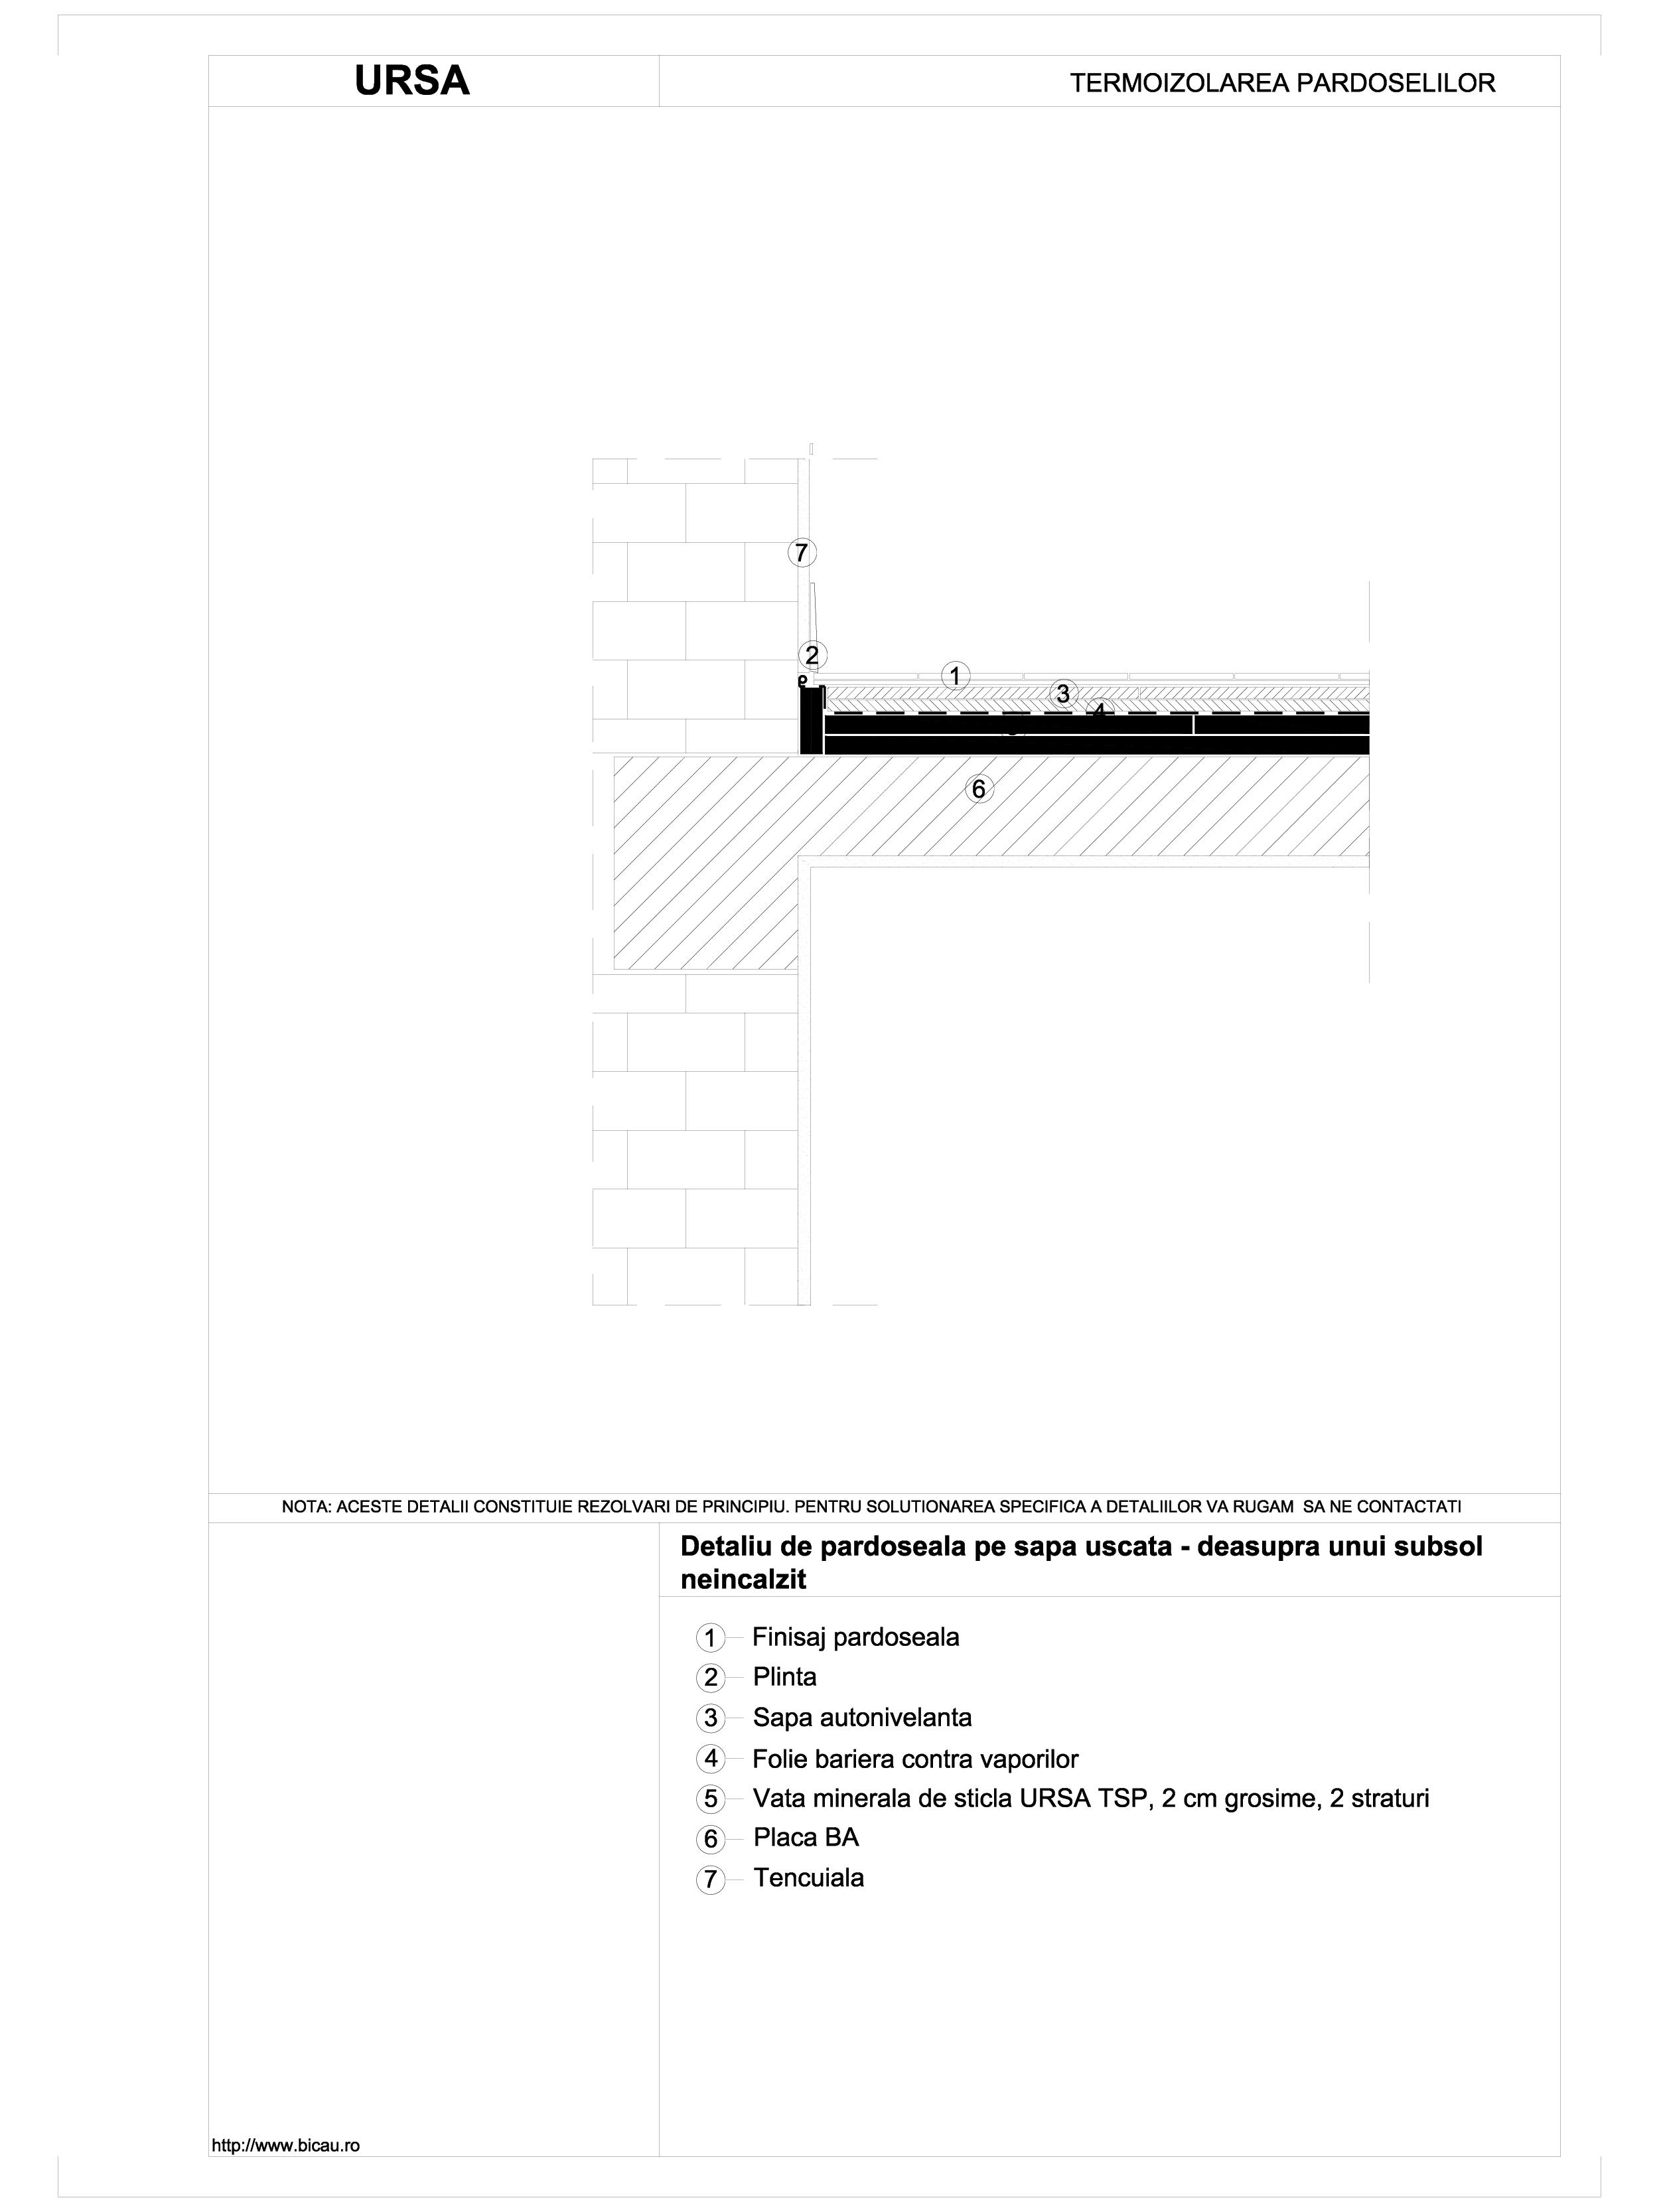 Detaliu de pardoseala pe sapa uscata - deasupra unui subsol neincalzit TSP URSA Vata minerala pentru pardoseli URSA ROMANIA   - Pagina 1